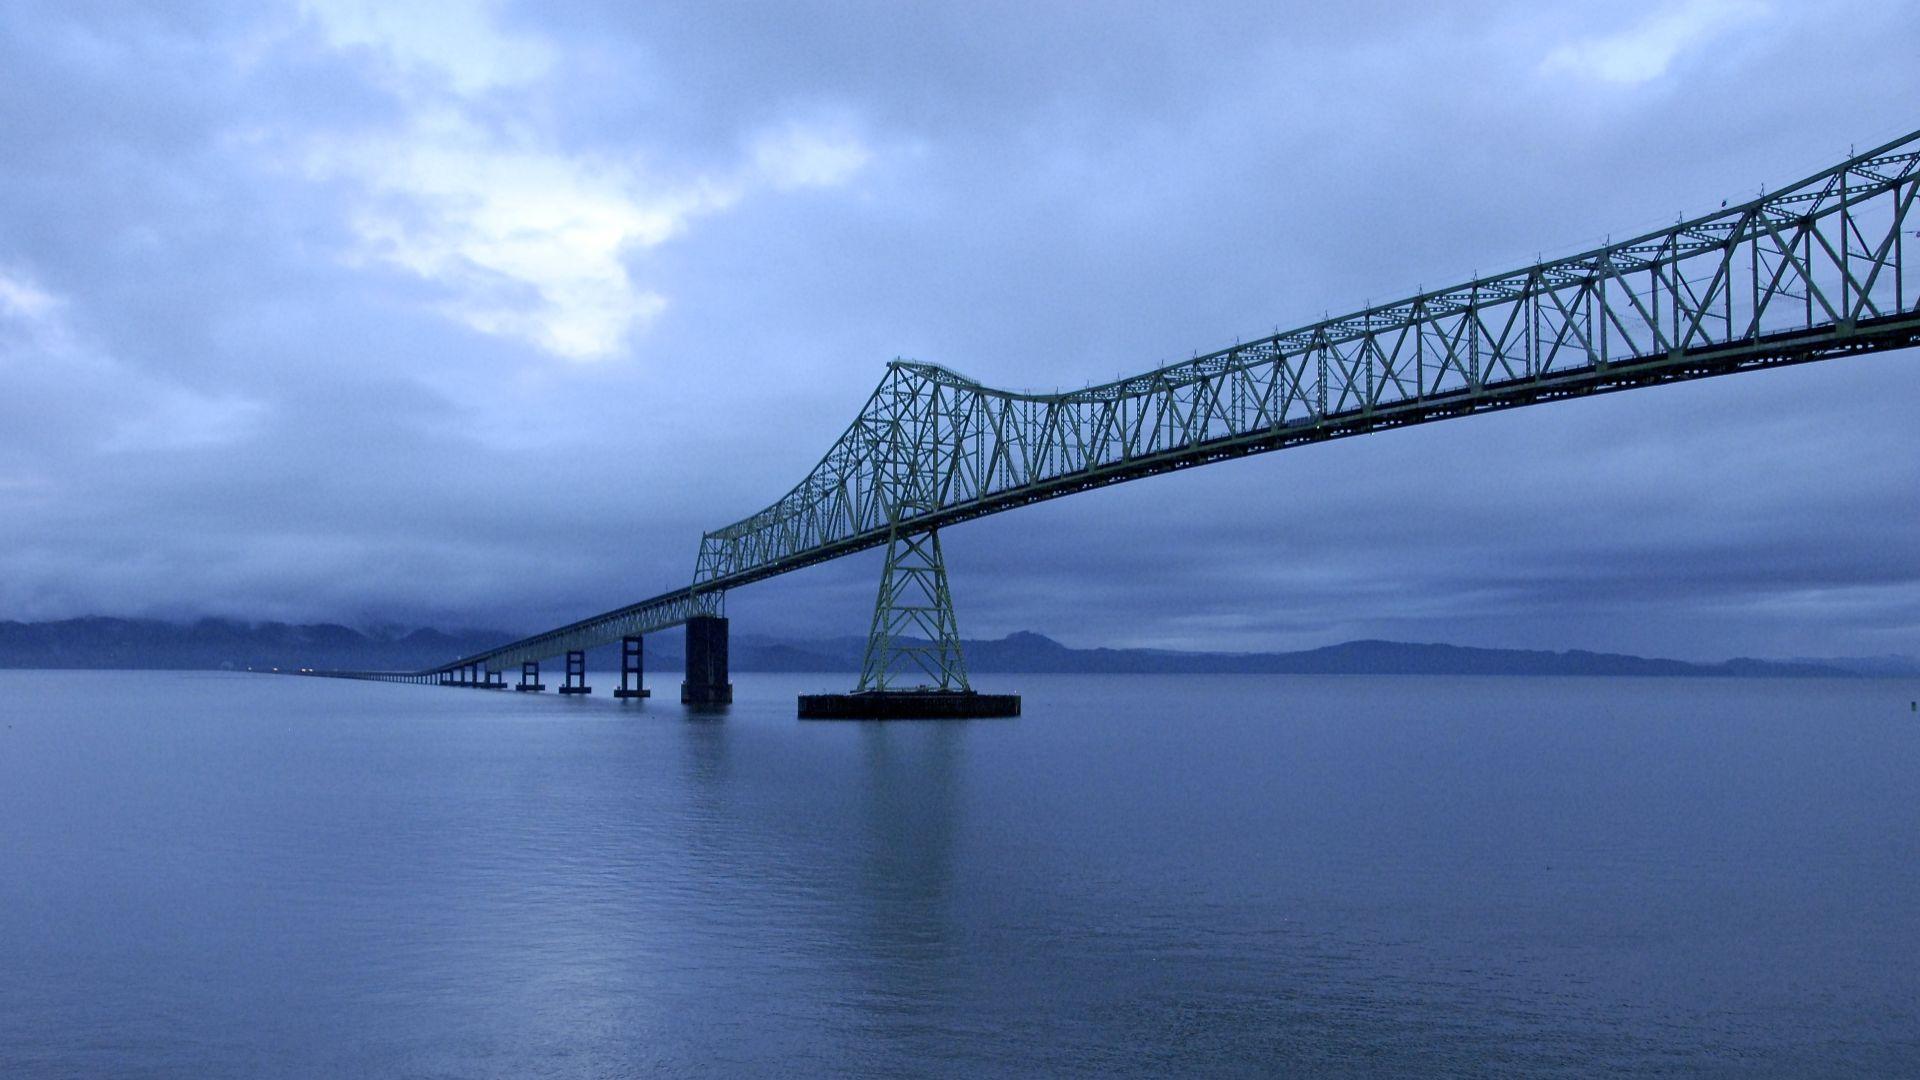 AstoriaMegler Bridge HD Wallpaper Background Image 1920x1080 1920x1080